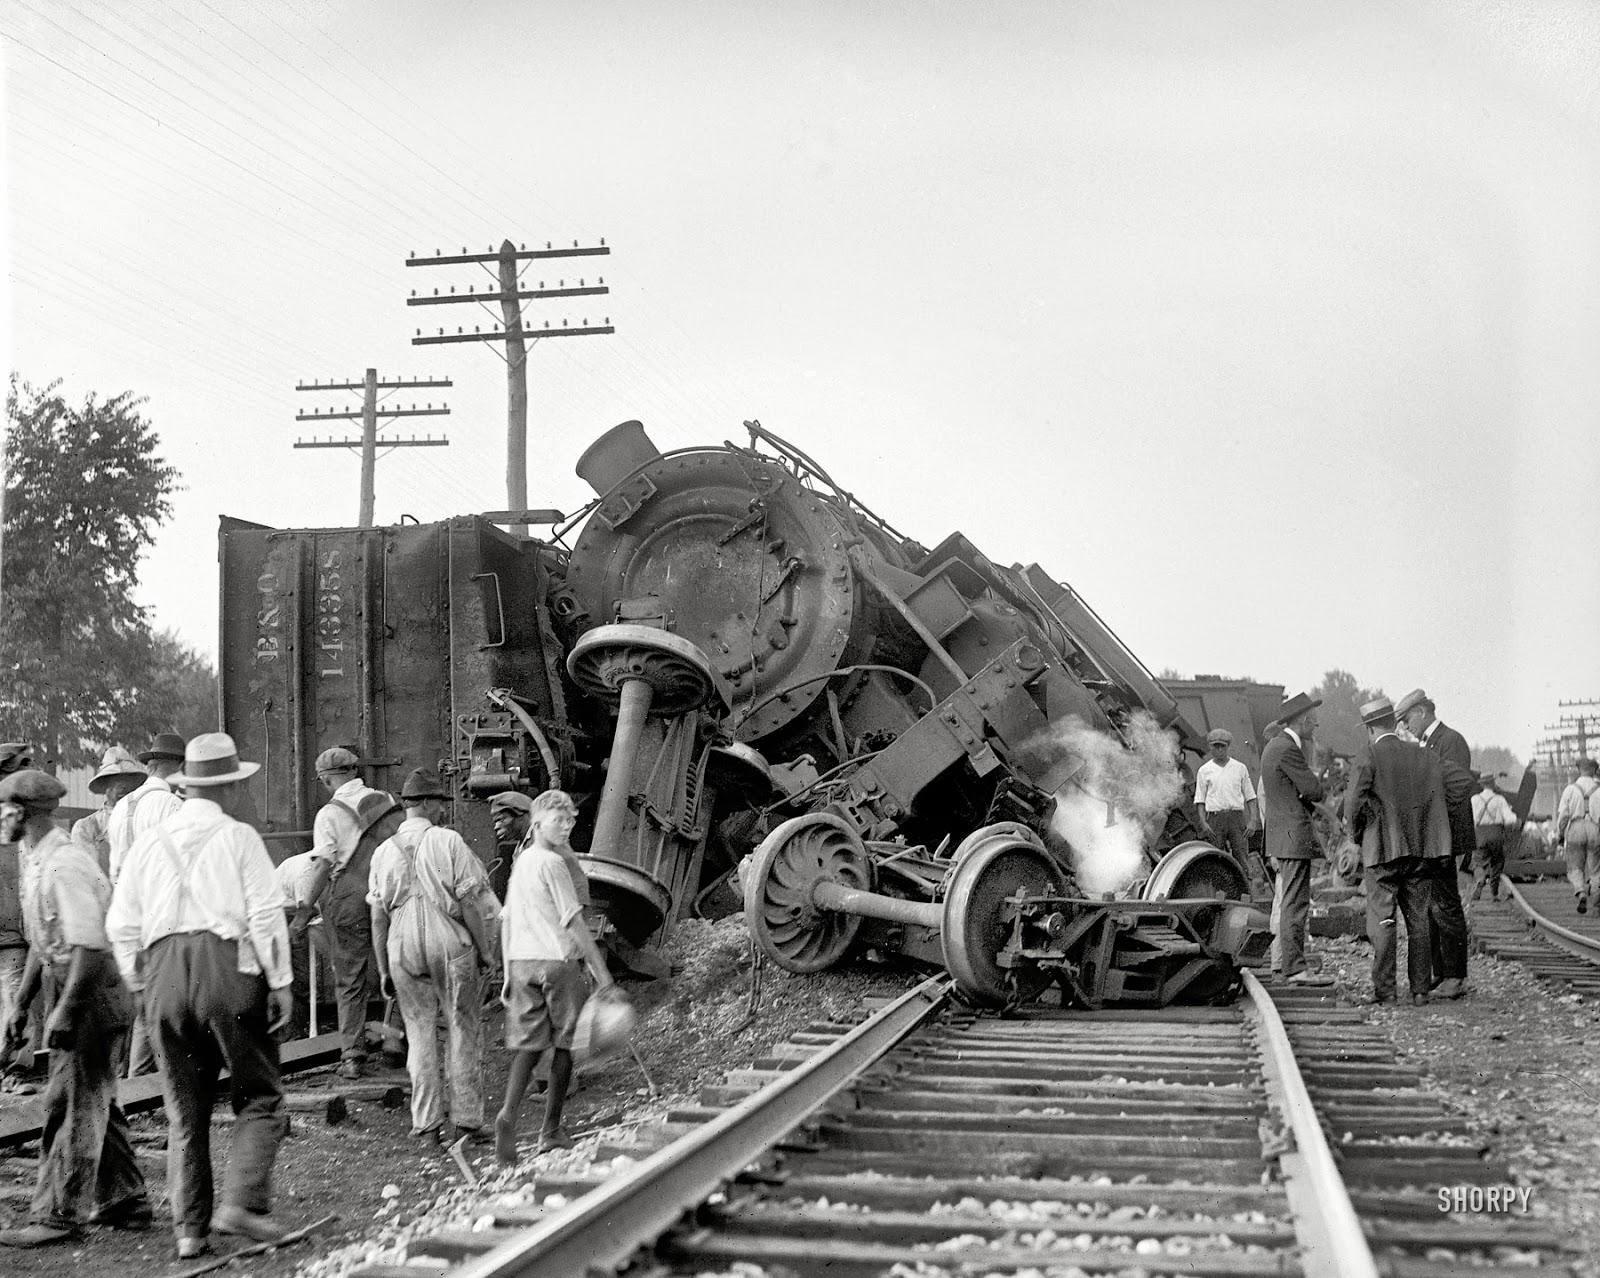 Just A Car Guy: Bad train wreck, great photo  |Rail Road Train Wreck